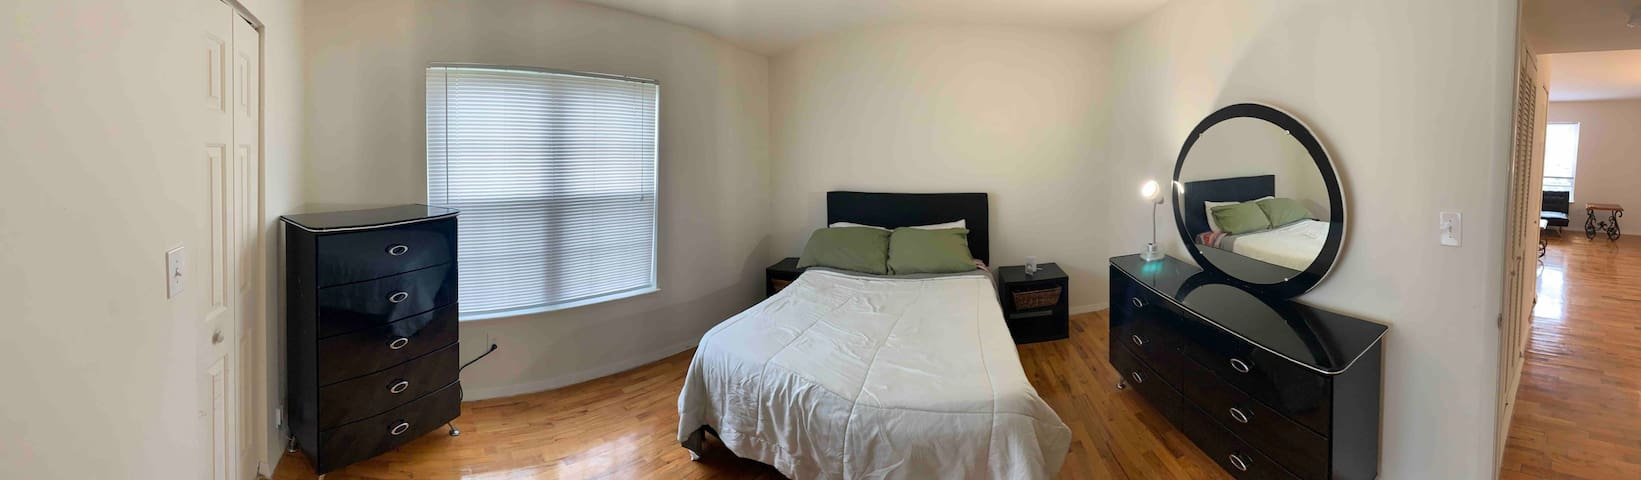 Cozy One Bedroom